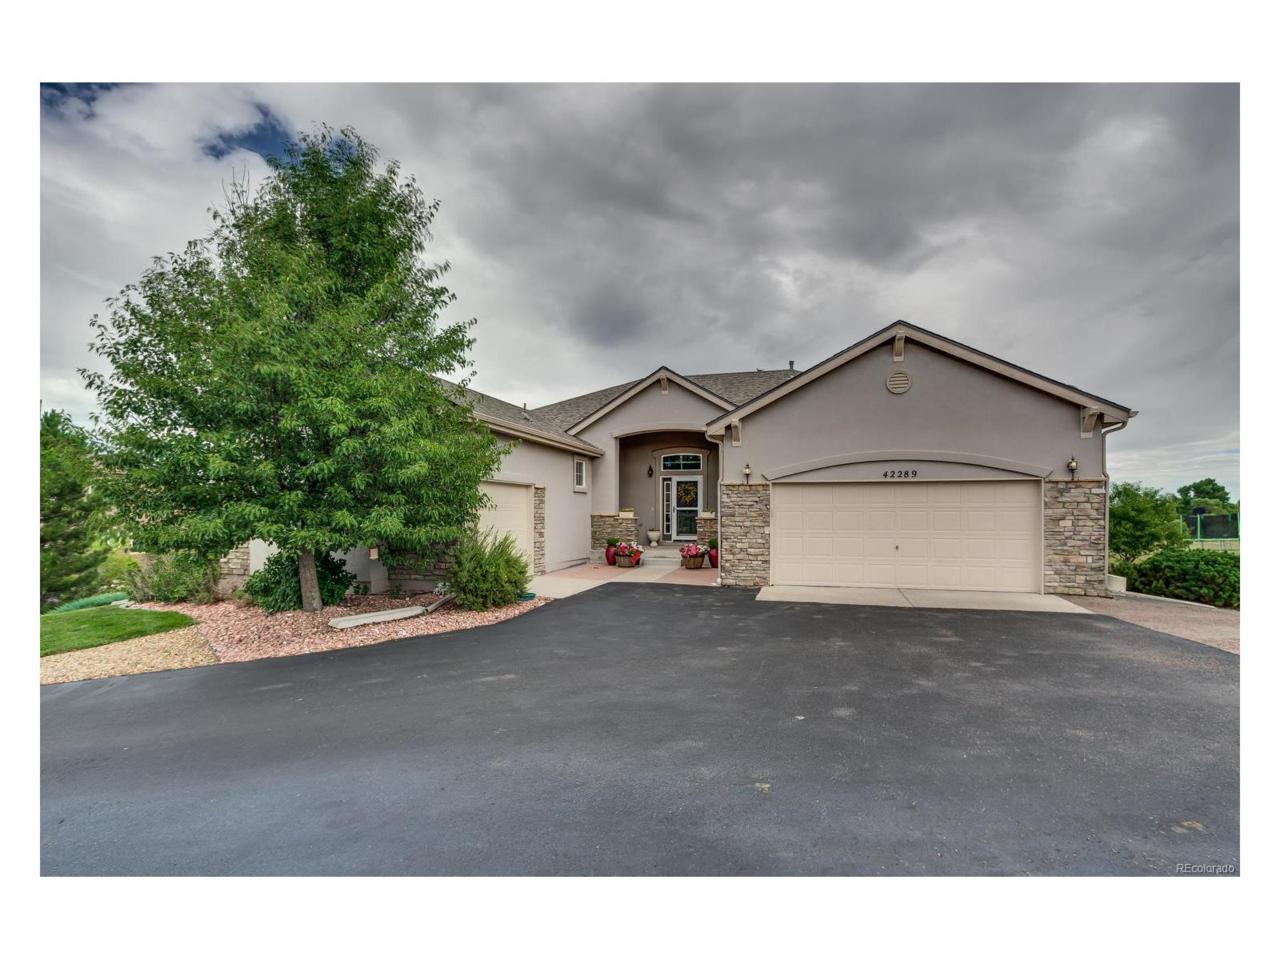 42289 Kingsmill Circle, Elizabeth, CO 80107 (MLS #3221658) :: 8z Real Estate